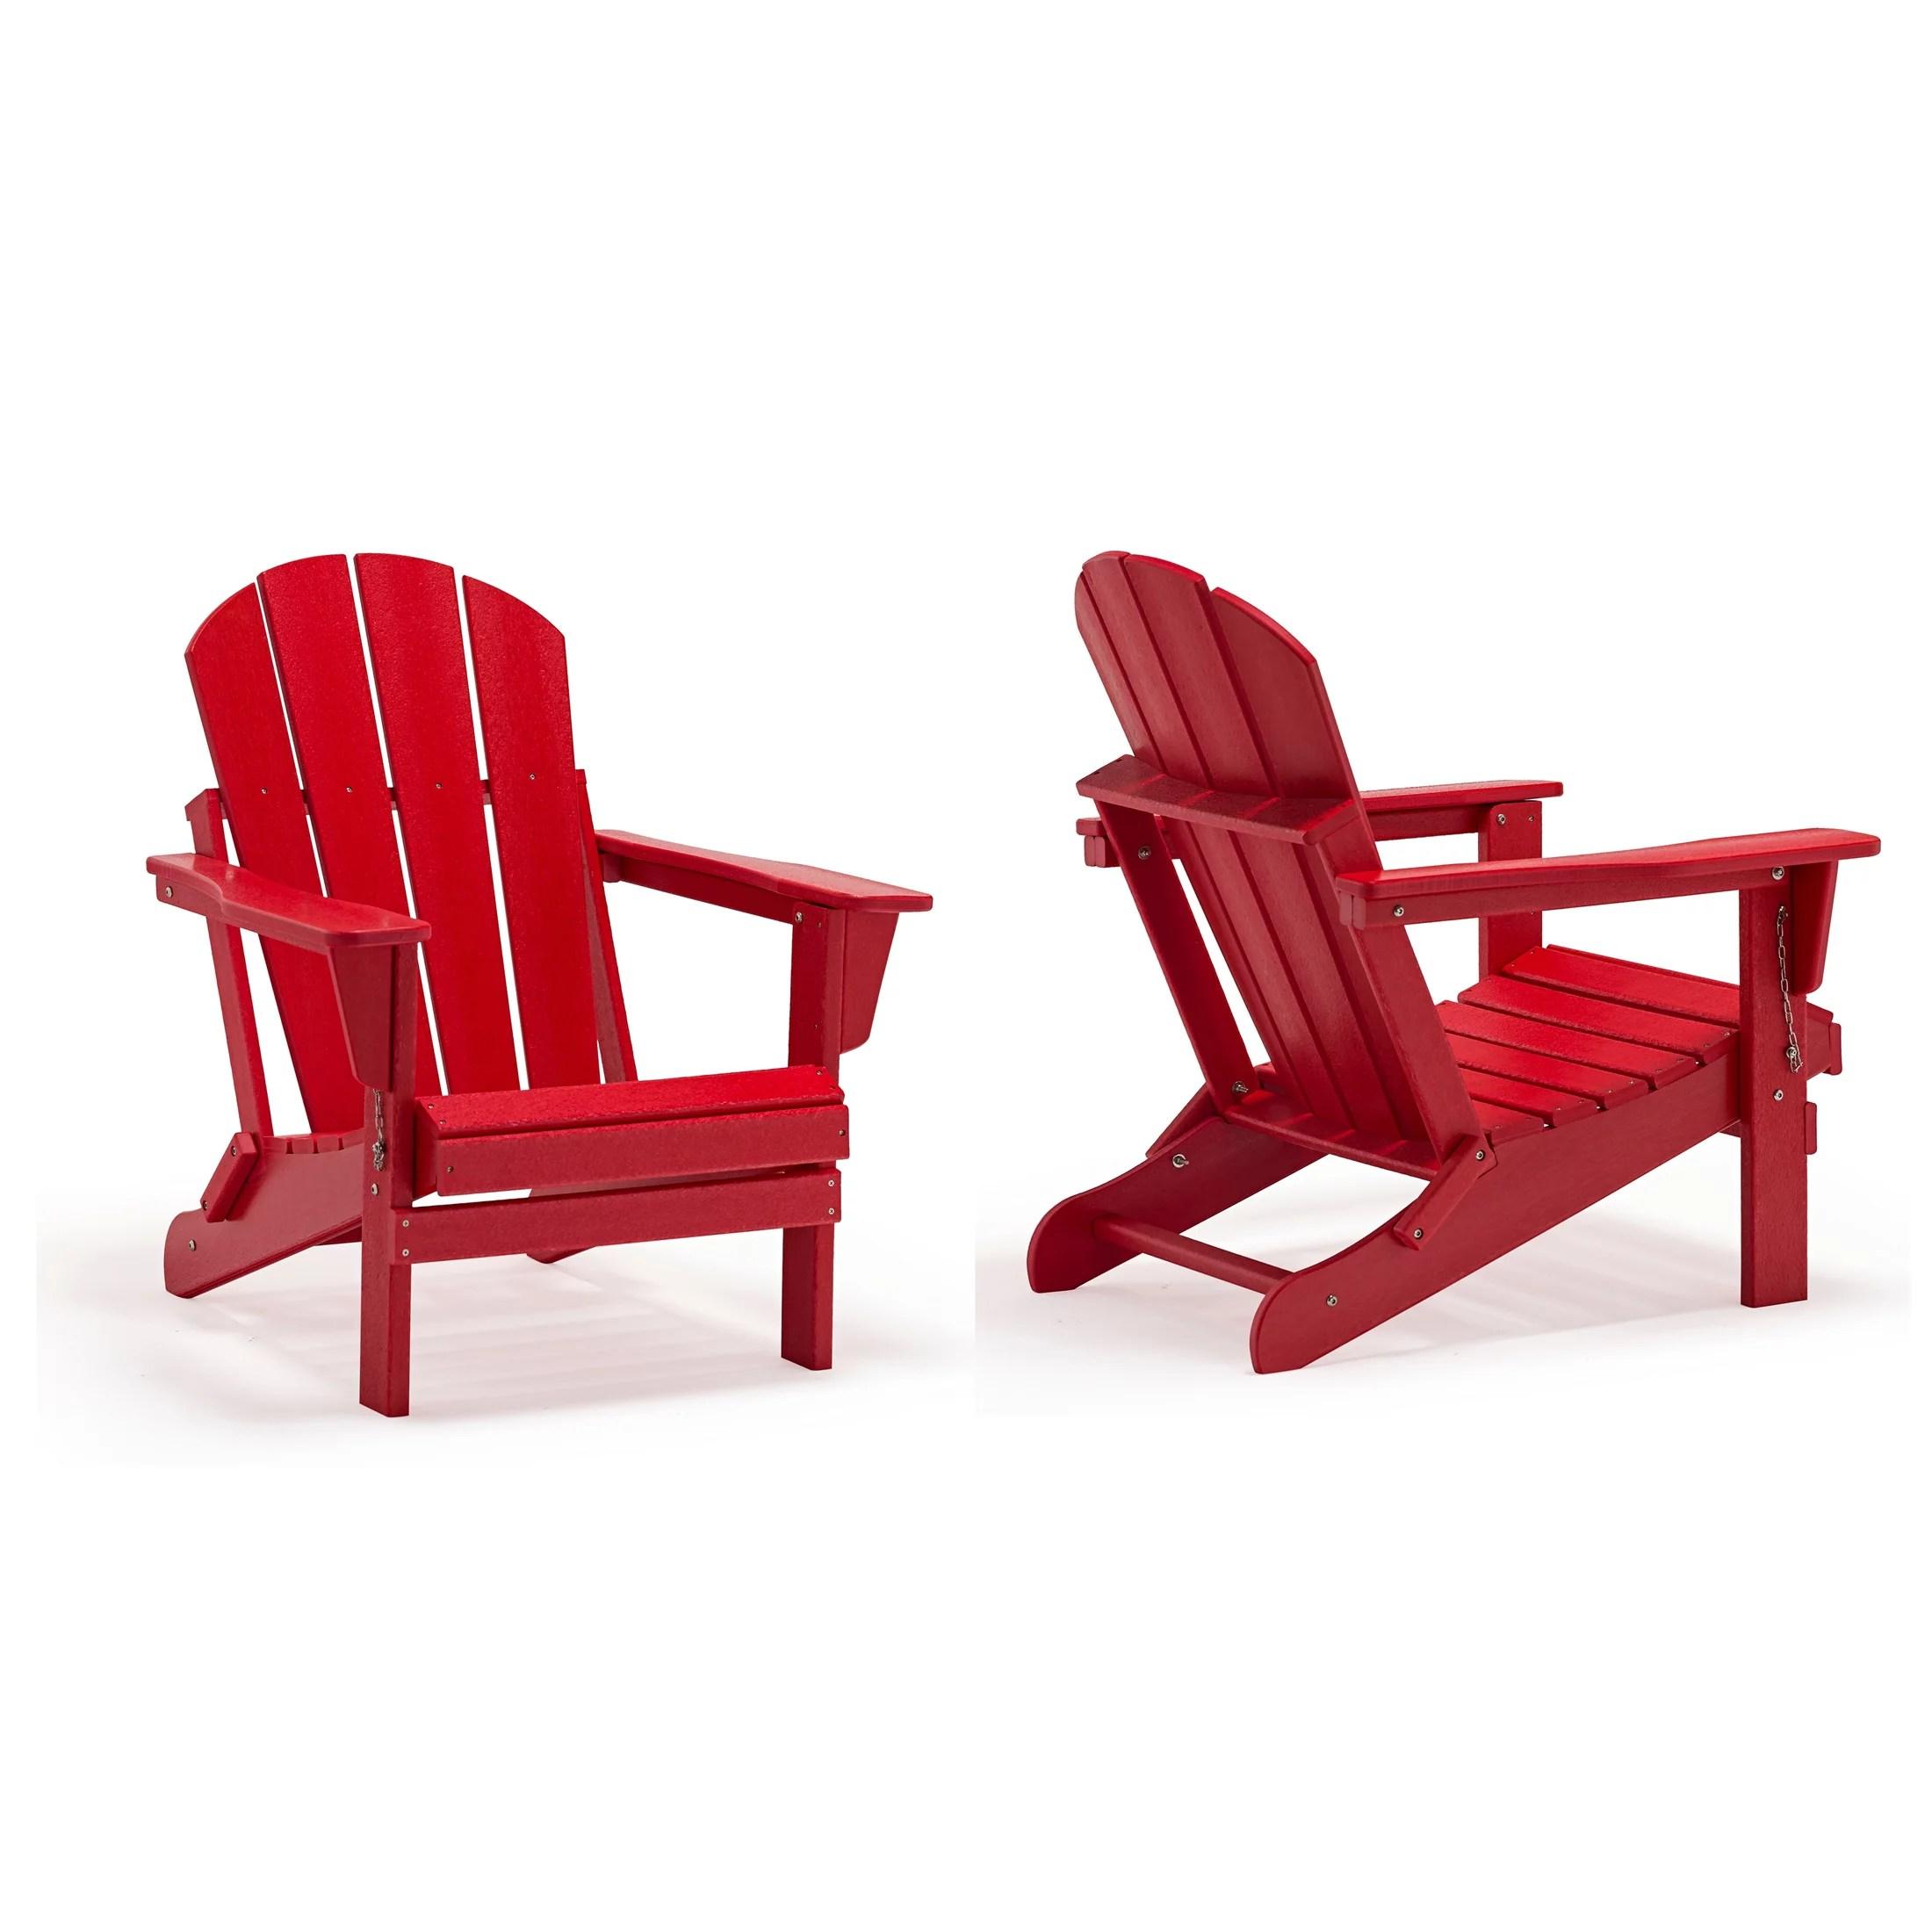 braxton outdoor folding plastic adirondack chair set of 2 red